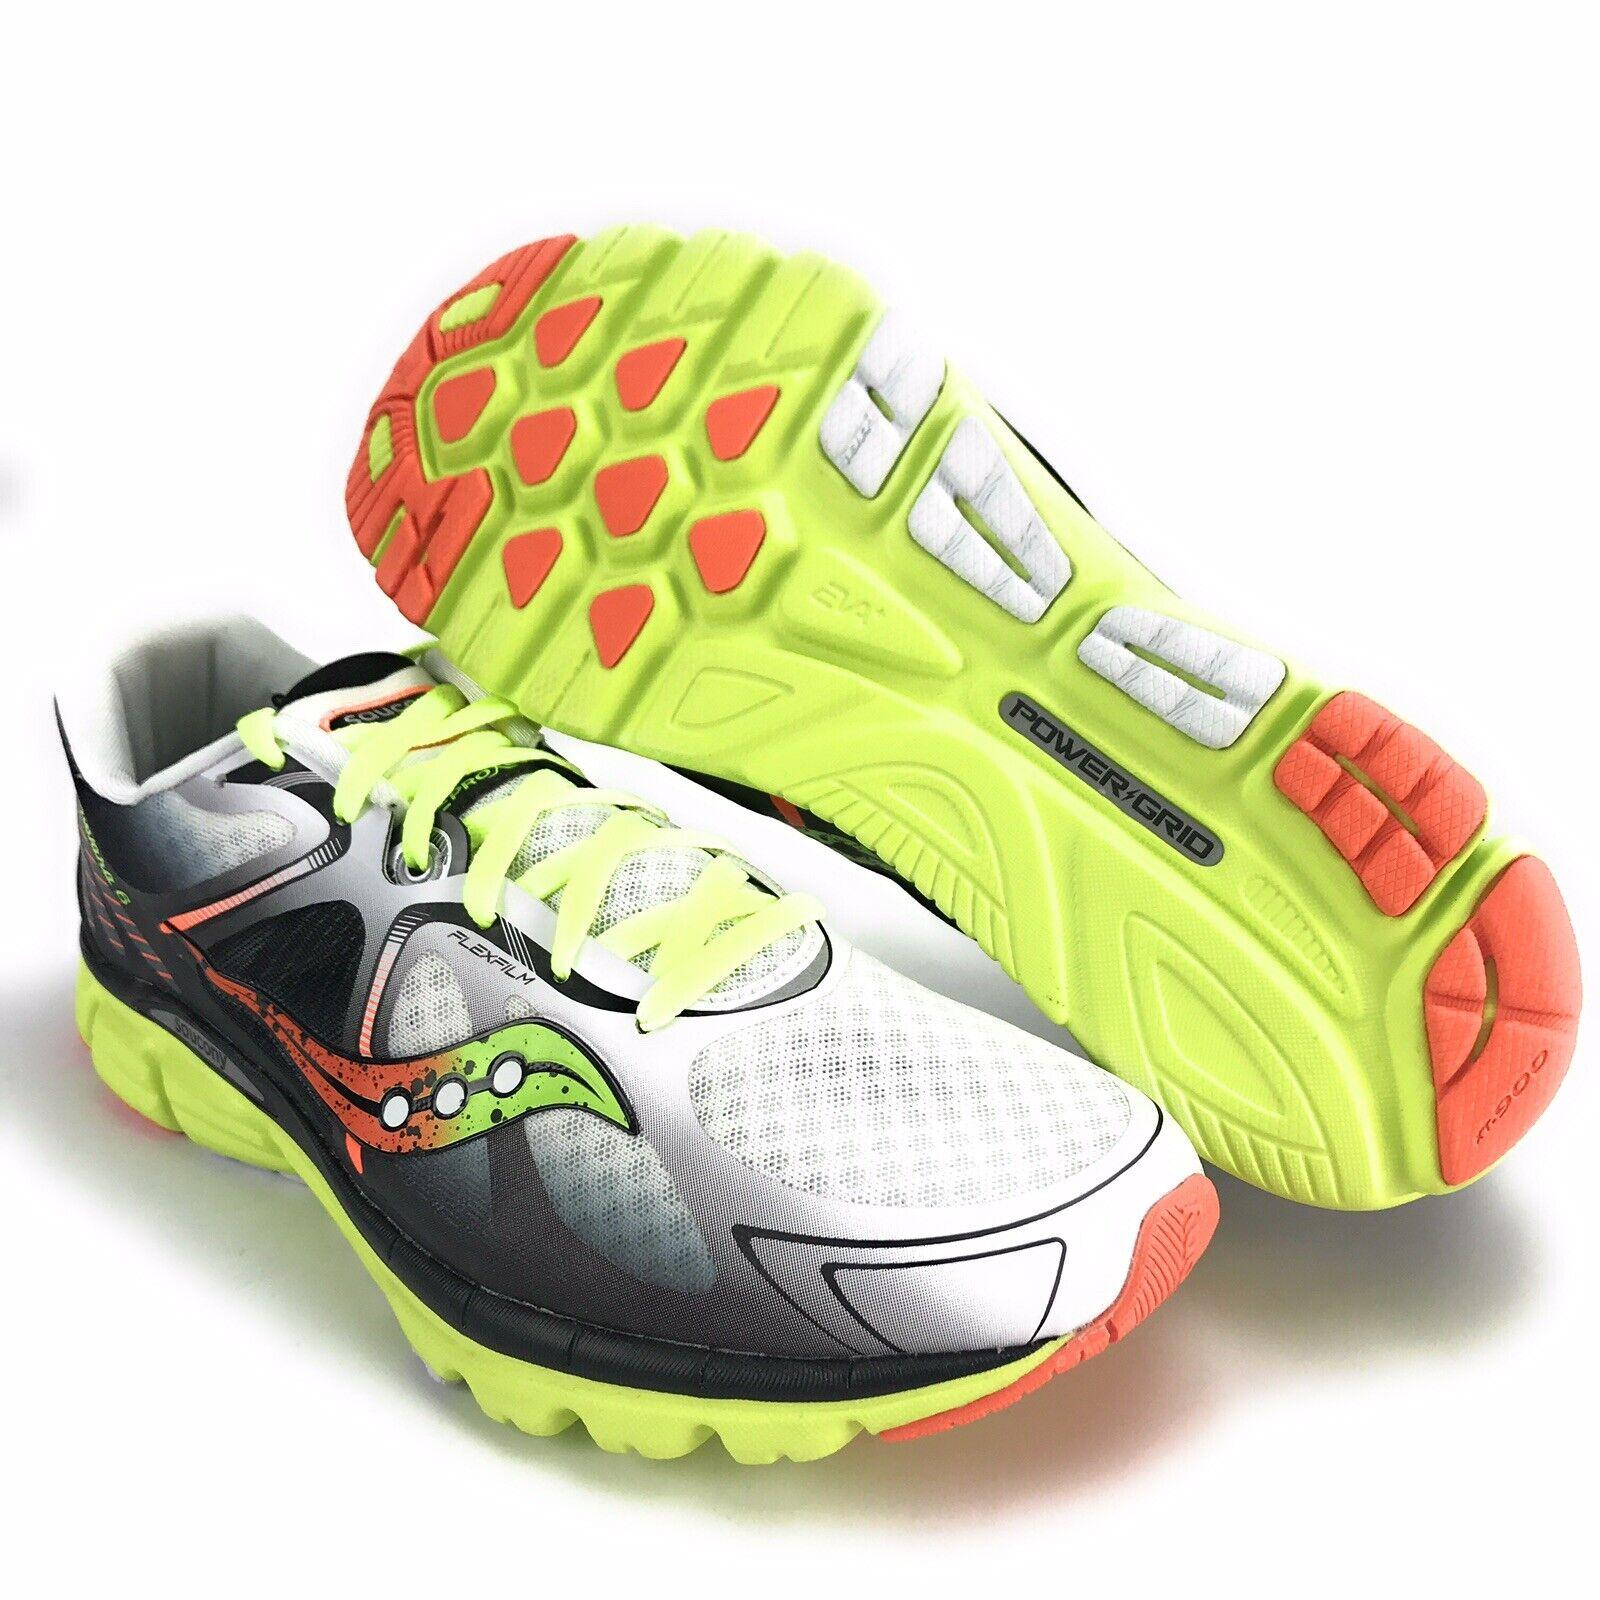 Saucony Men's Kinvara 6 White Citron orange Running shoes Size 14